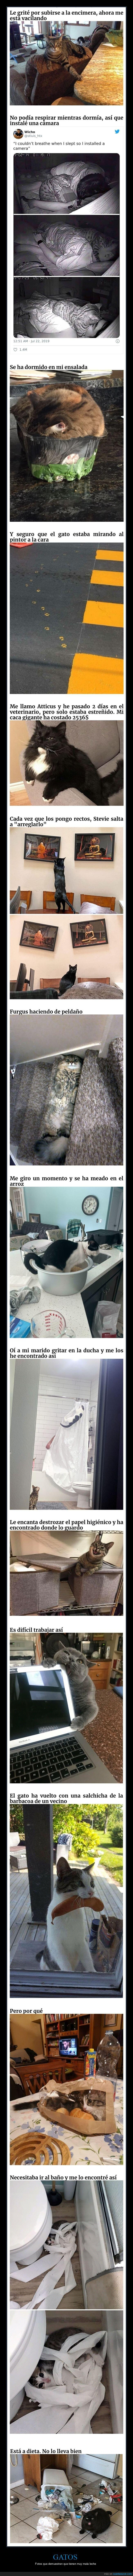 fails,gatos,mala leche